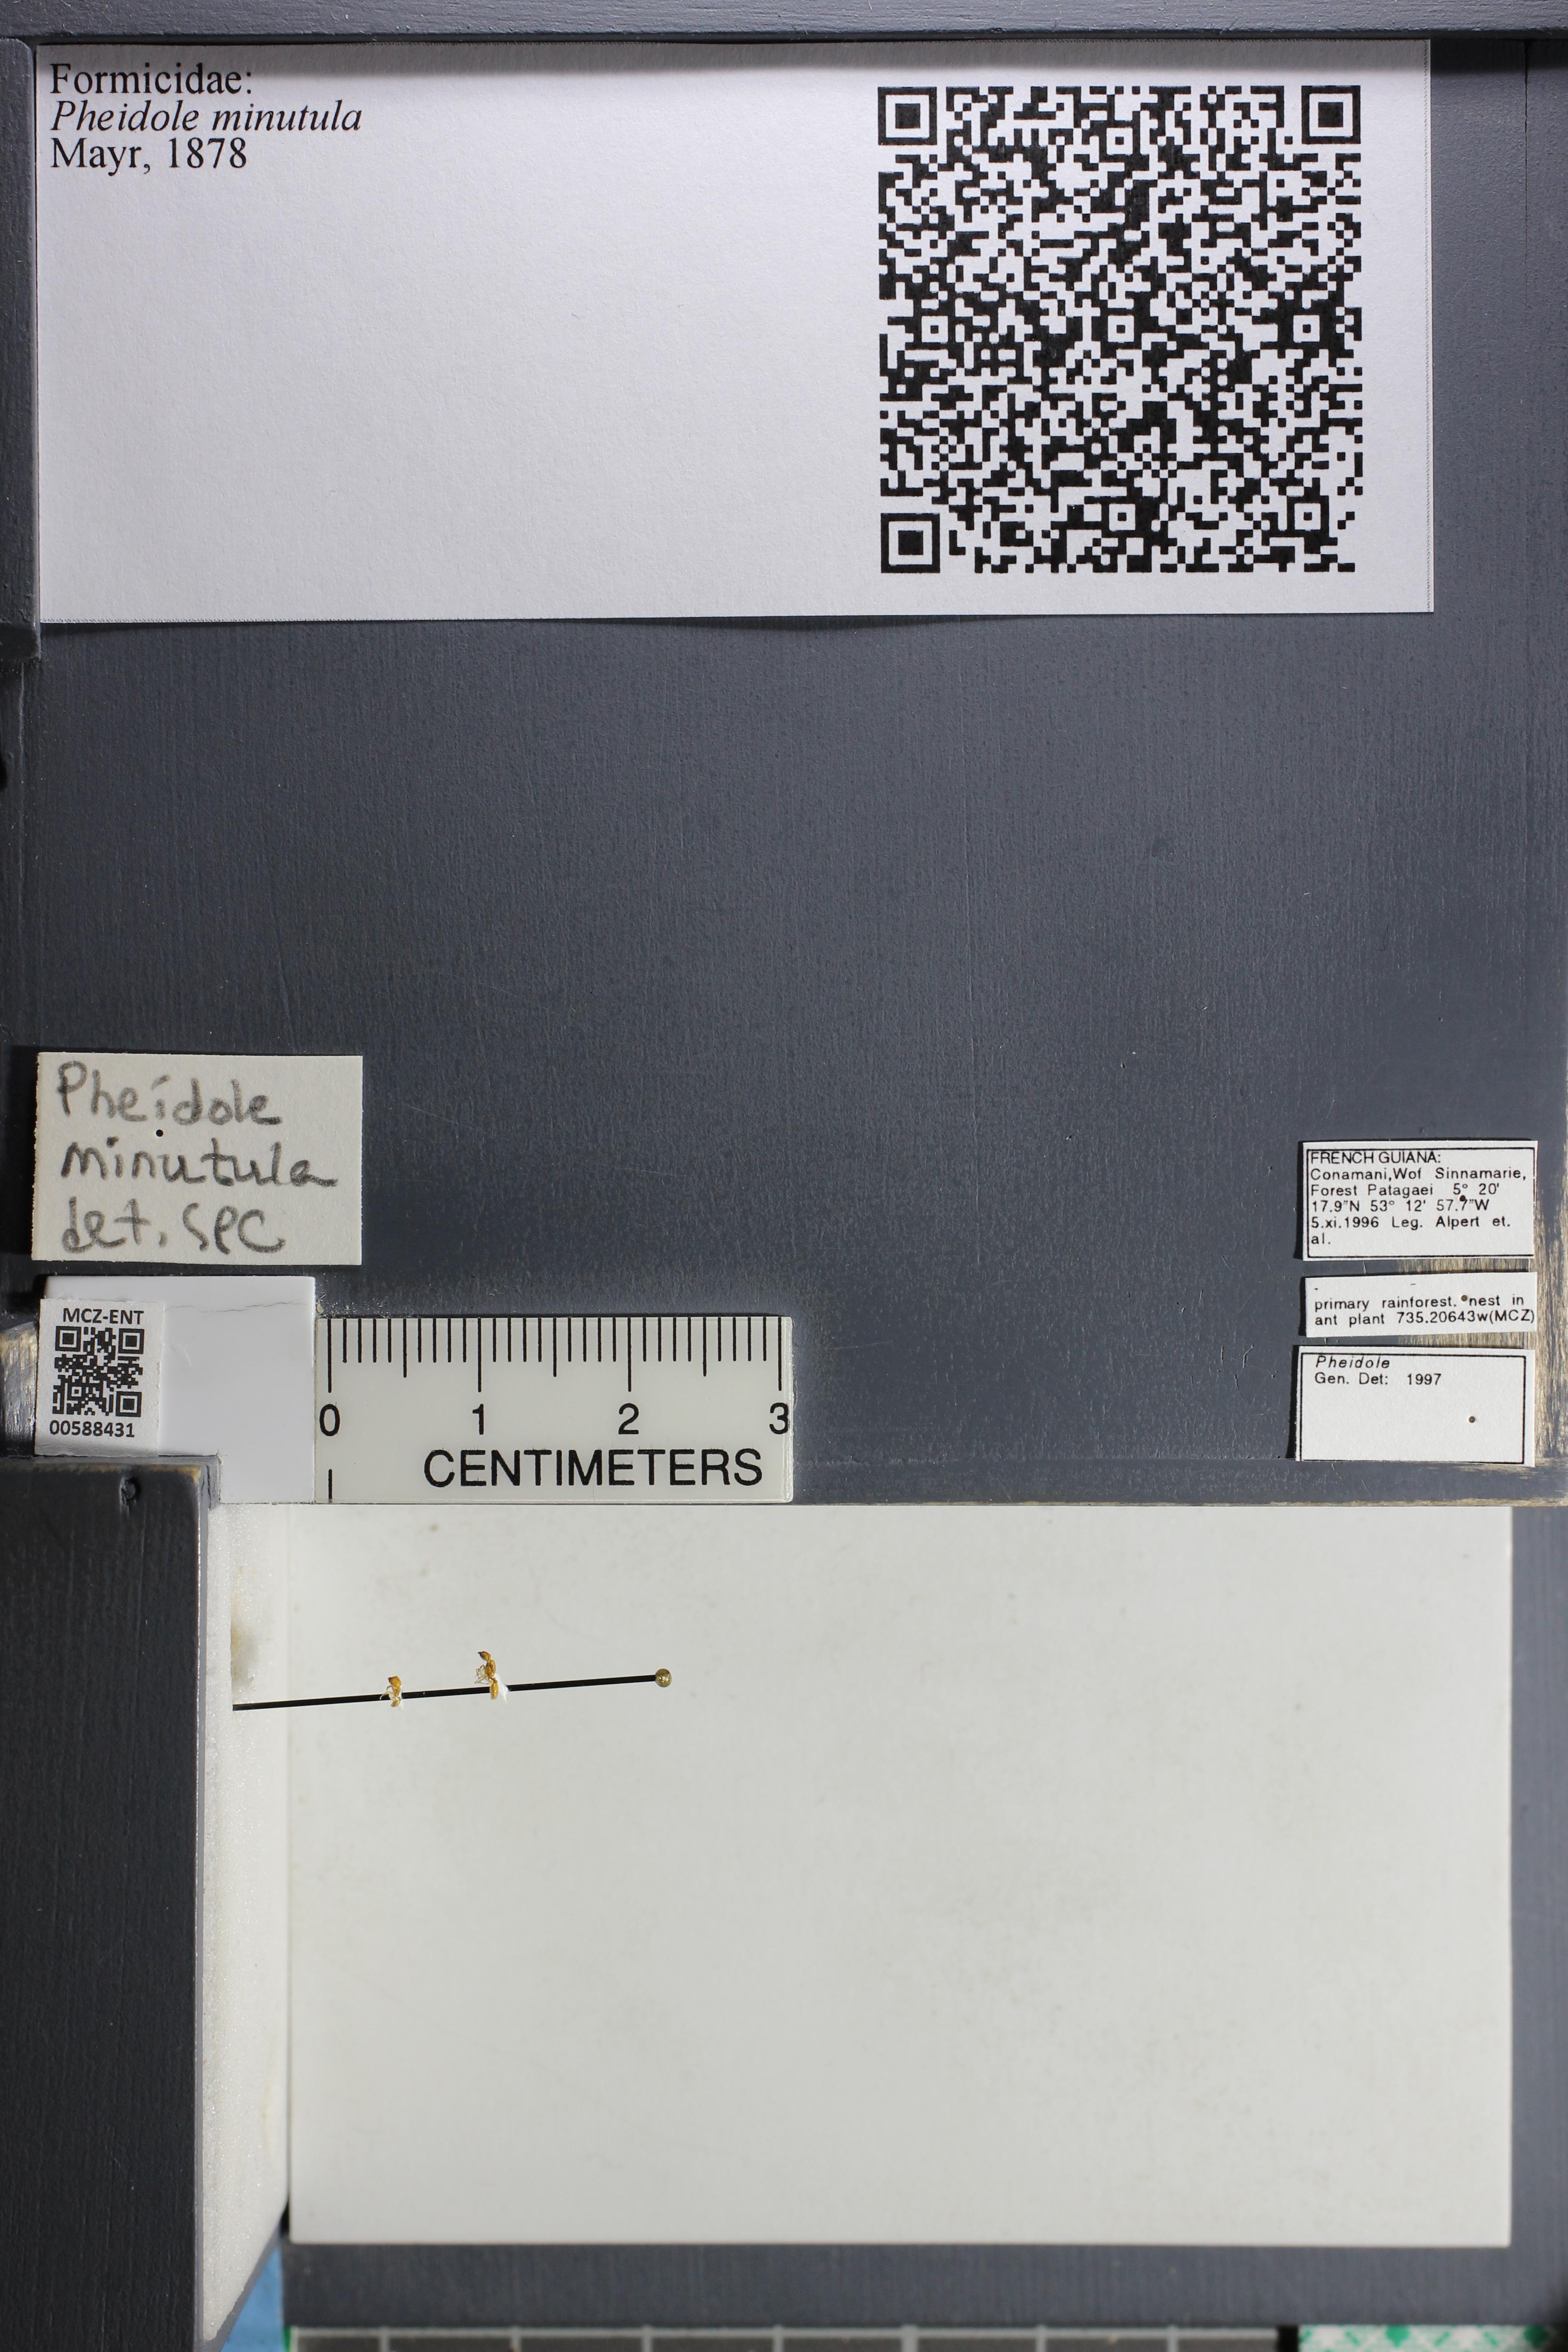 Image of Pheidole minutula